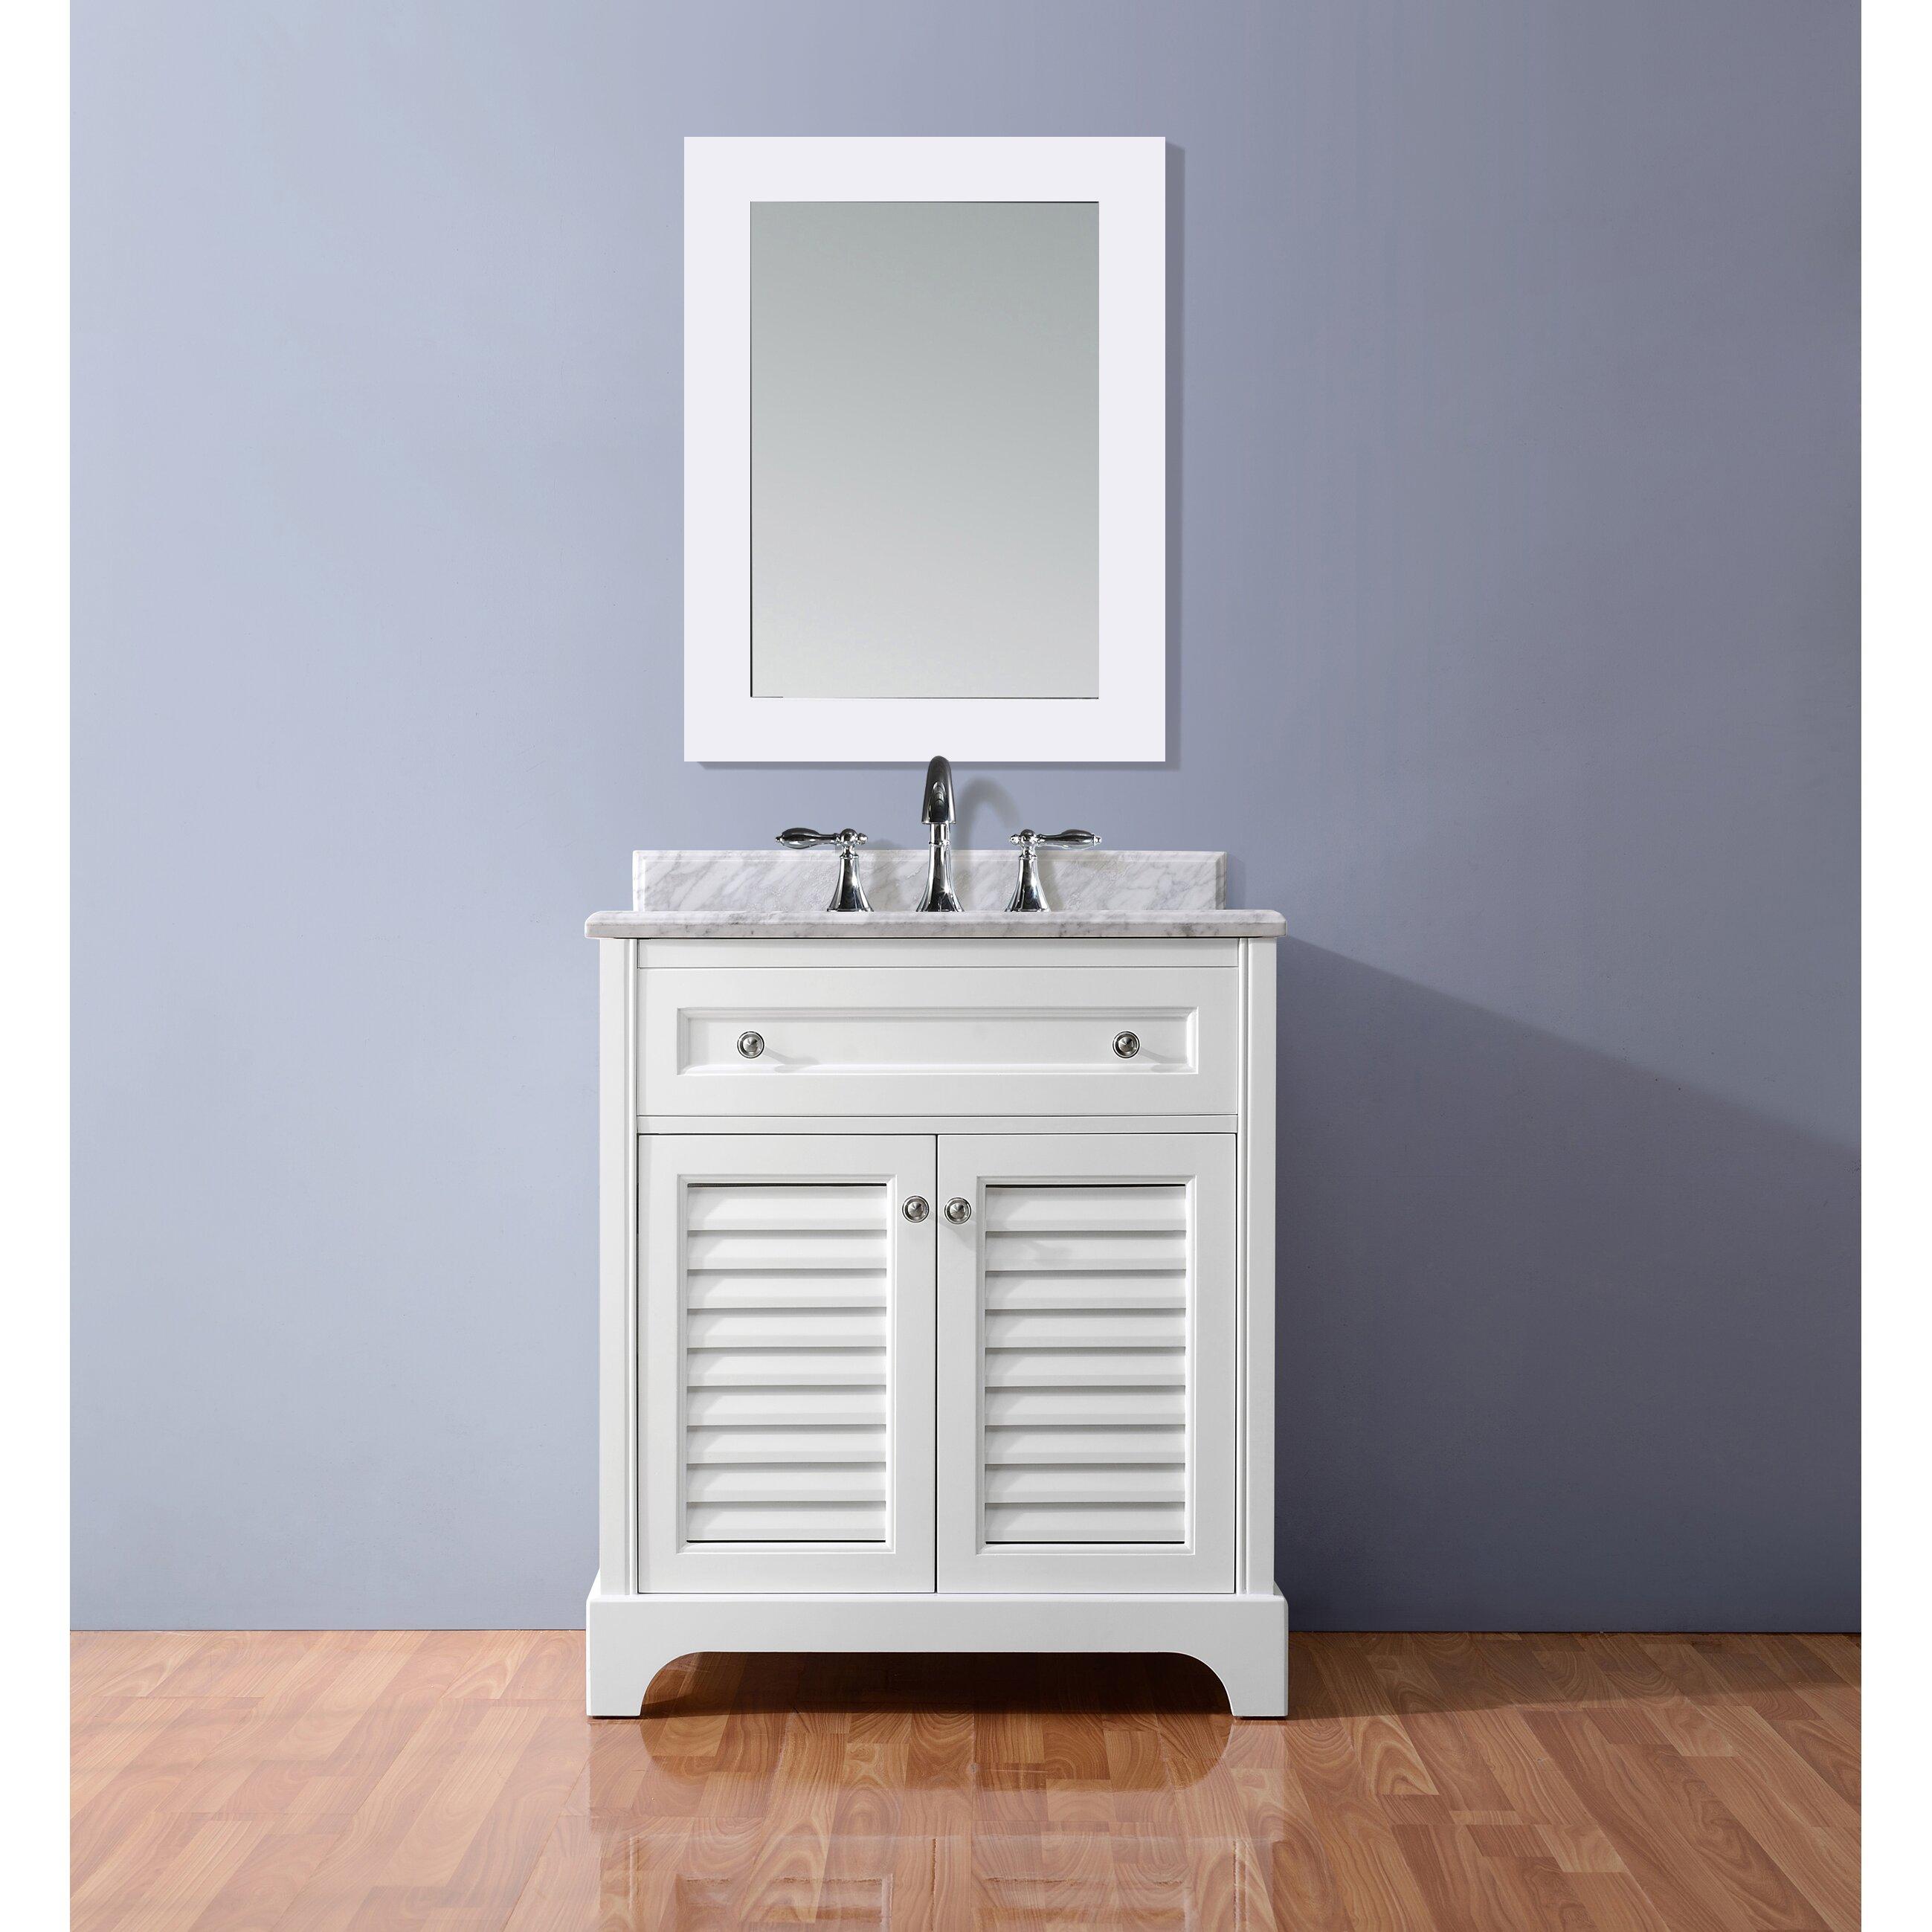 Wyndenhall salem 36 inch white quartz marble top single sink bathroom - Ari Kitchen Bath Madison 36 Single Bathroom Vanity Set